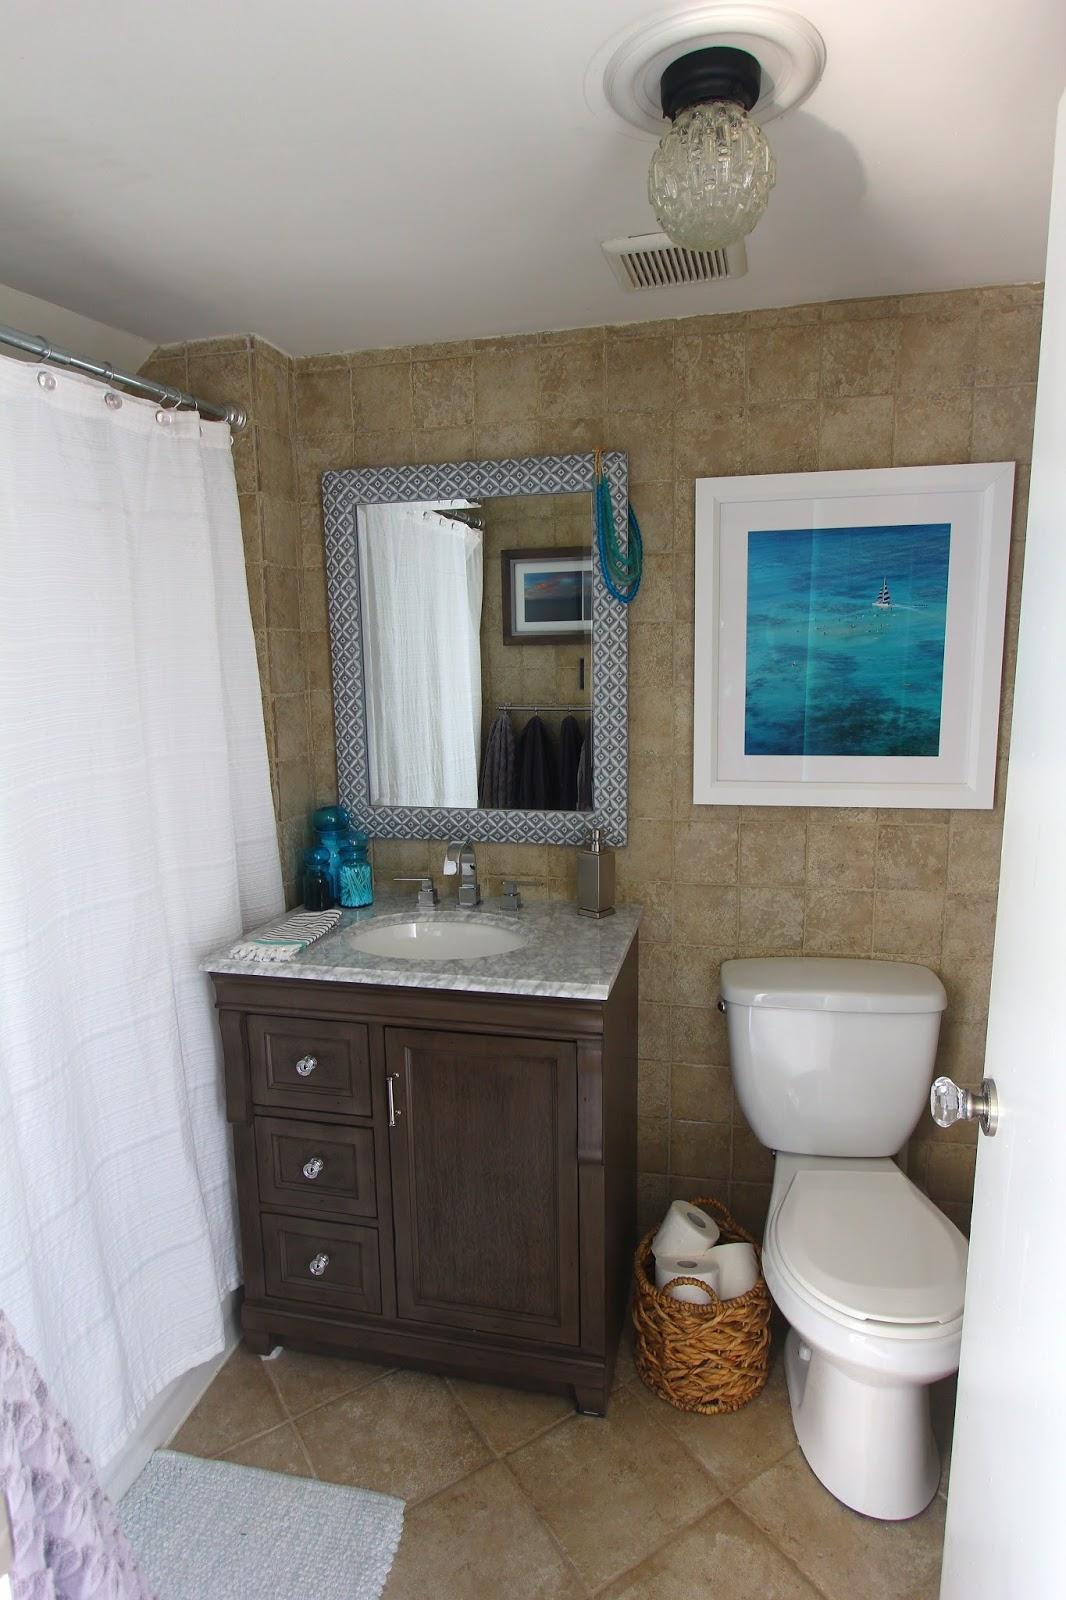 FiveElevenDecor Bathroom ReDesign - Bathroom re design